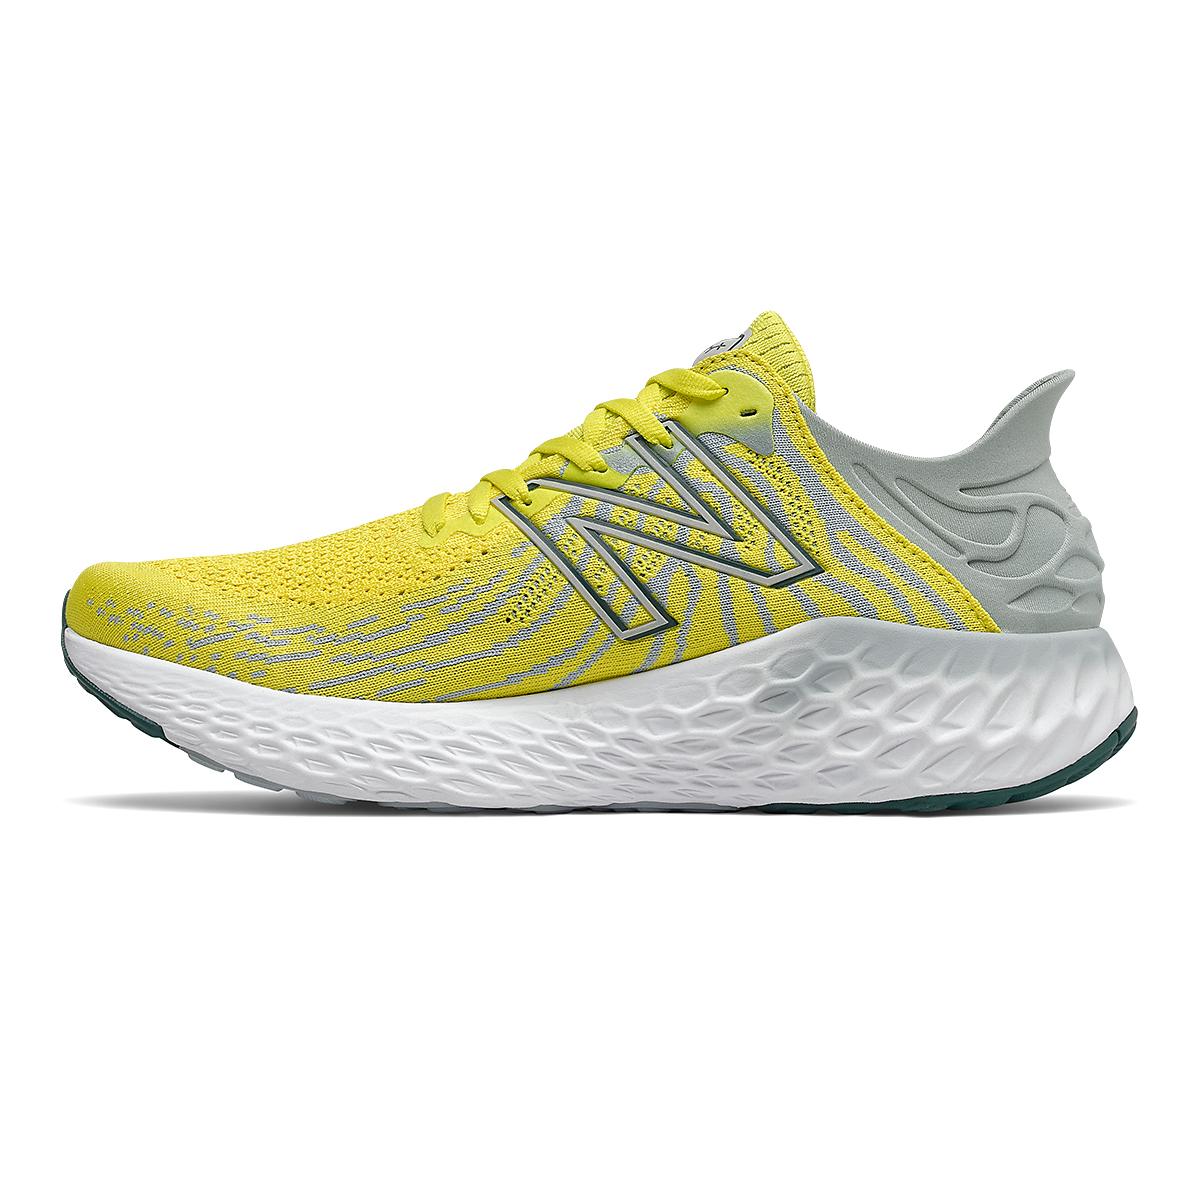 Men's New Balance 1080v11 Running Shoe - Color: Sulphur Yellow/Light Slate - Size: 6 - Width: Wide, Sulphur Yellow/Light Slate, large, image 2